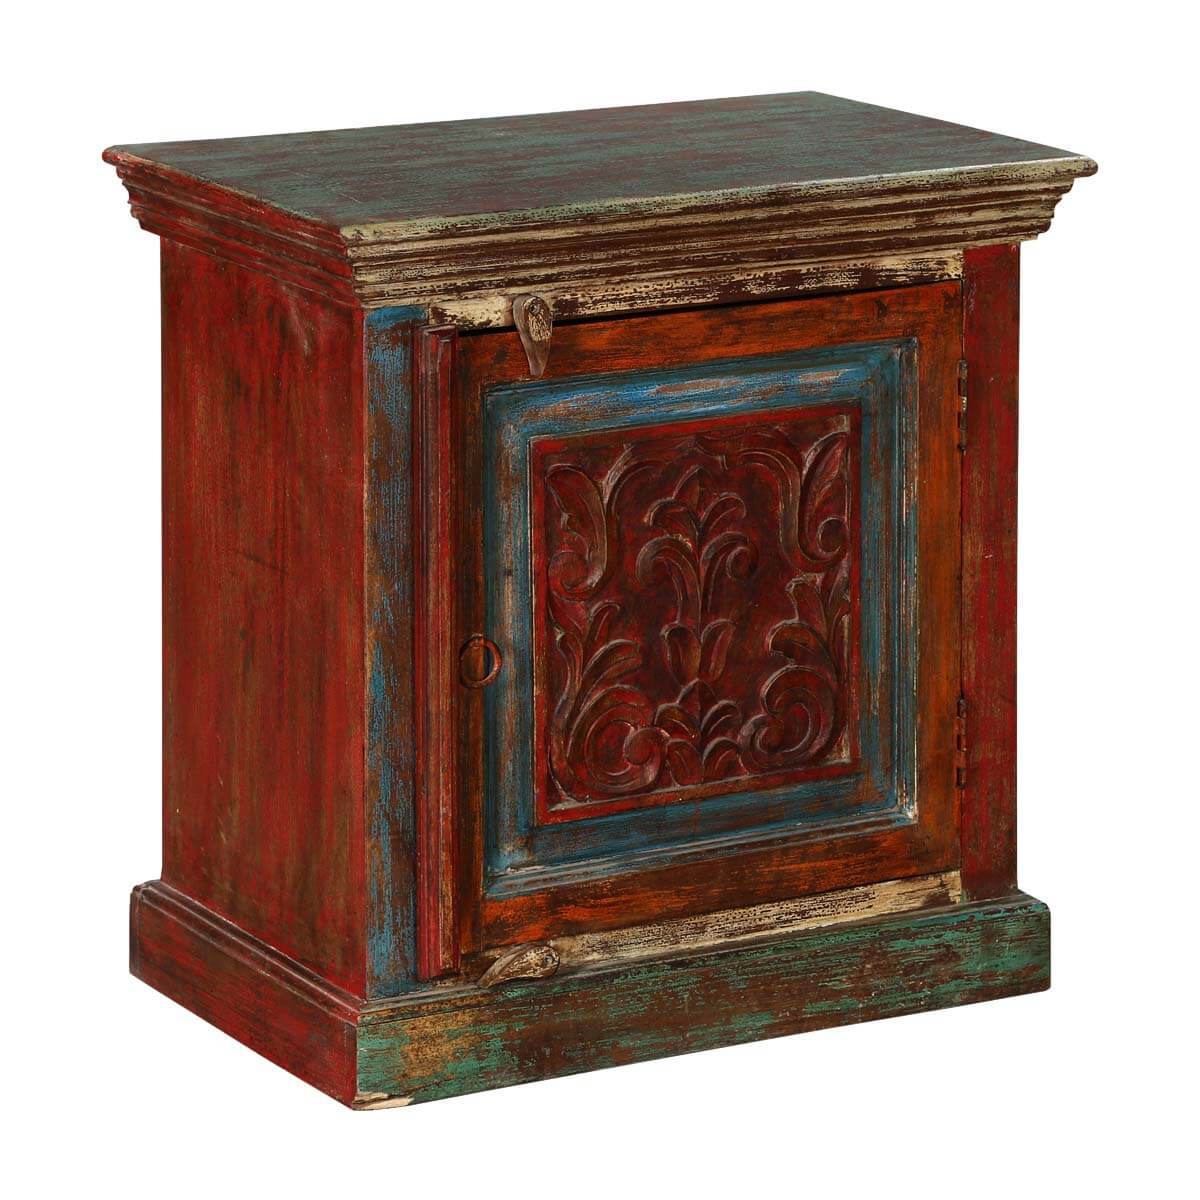 Rustic Fleur-de-lis Mango Wood Nightstand End Table Cabinet